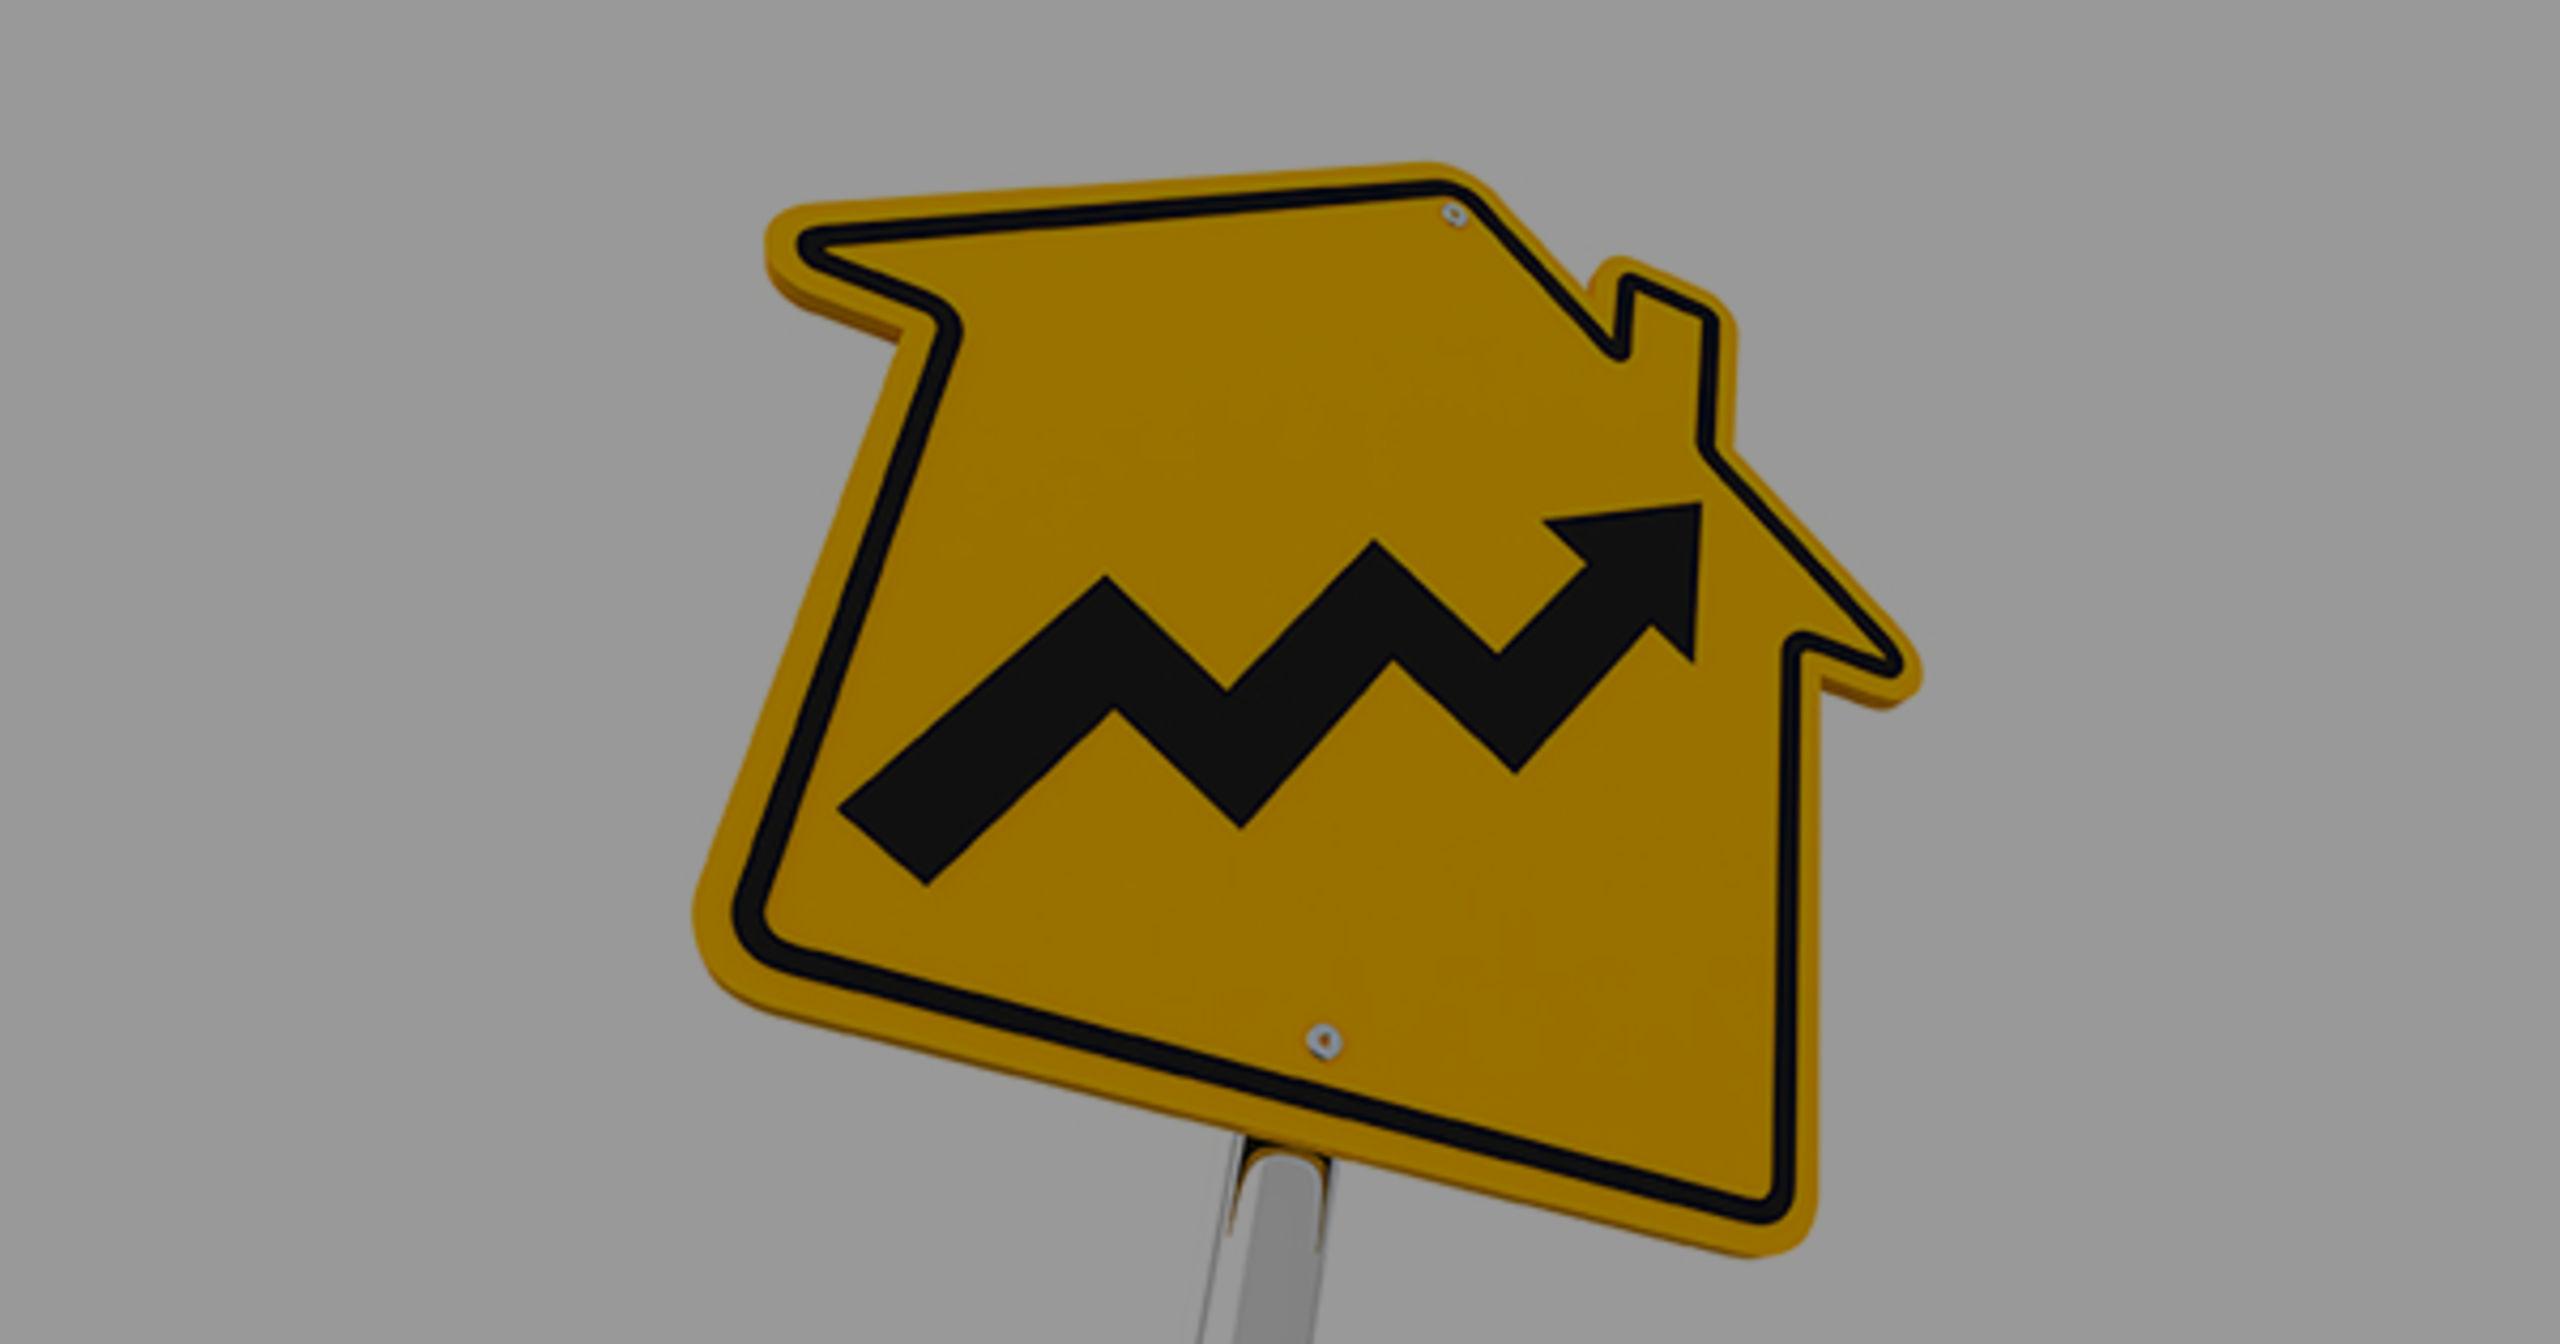 Existing Home Sales Rebound in December